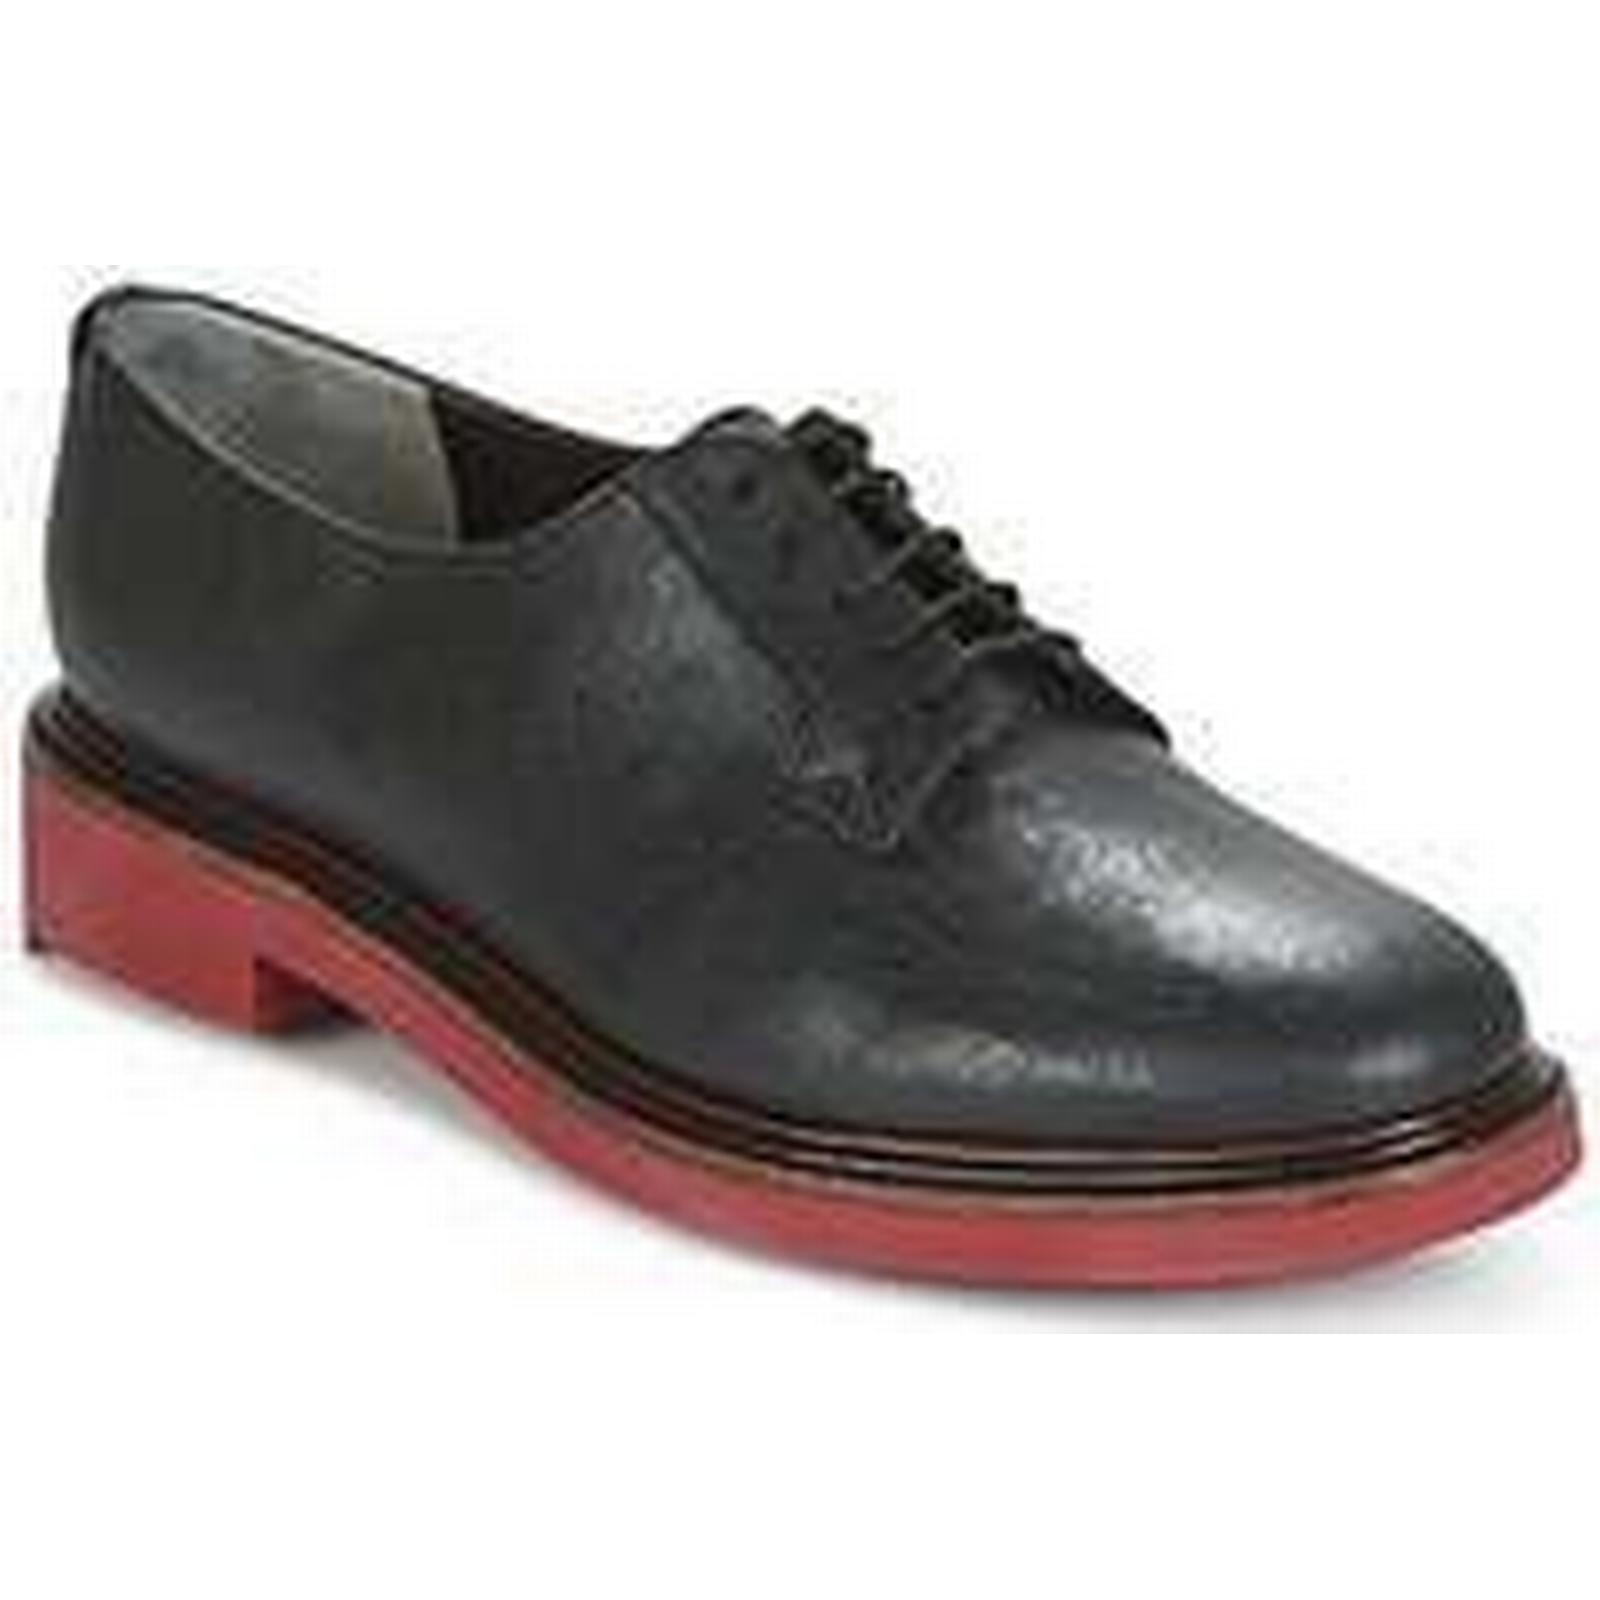 Spartoo.co.uk Robert Shoes Clergerie JONCKO-GRAFFITI-NOIR women's Casual Shoes Robert in Black df8953